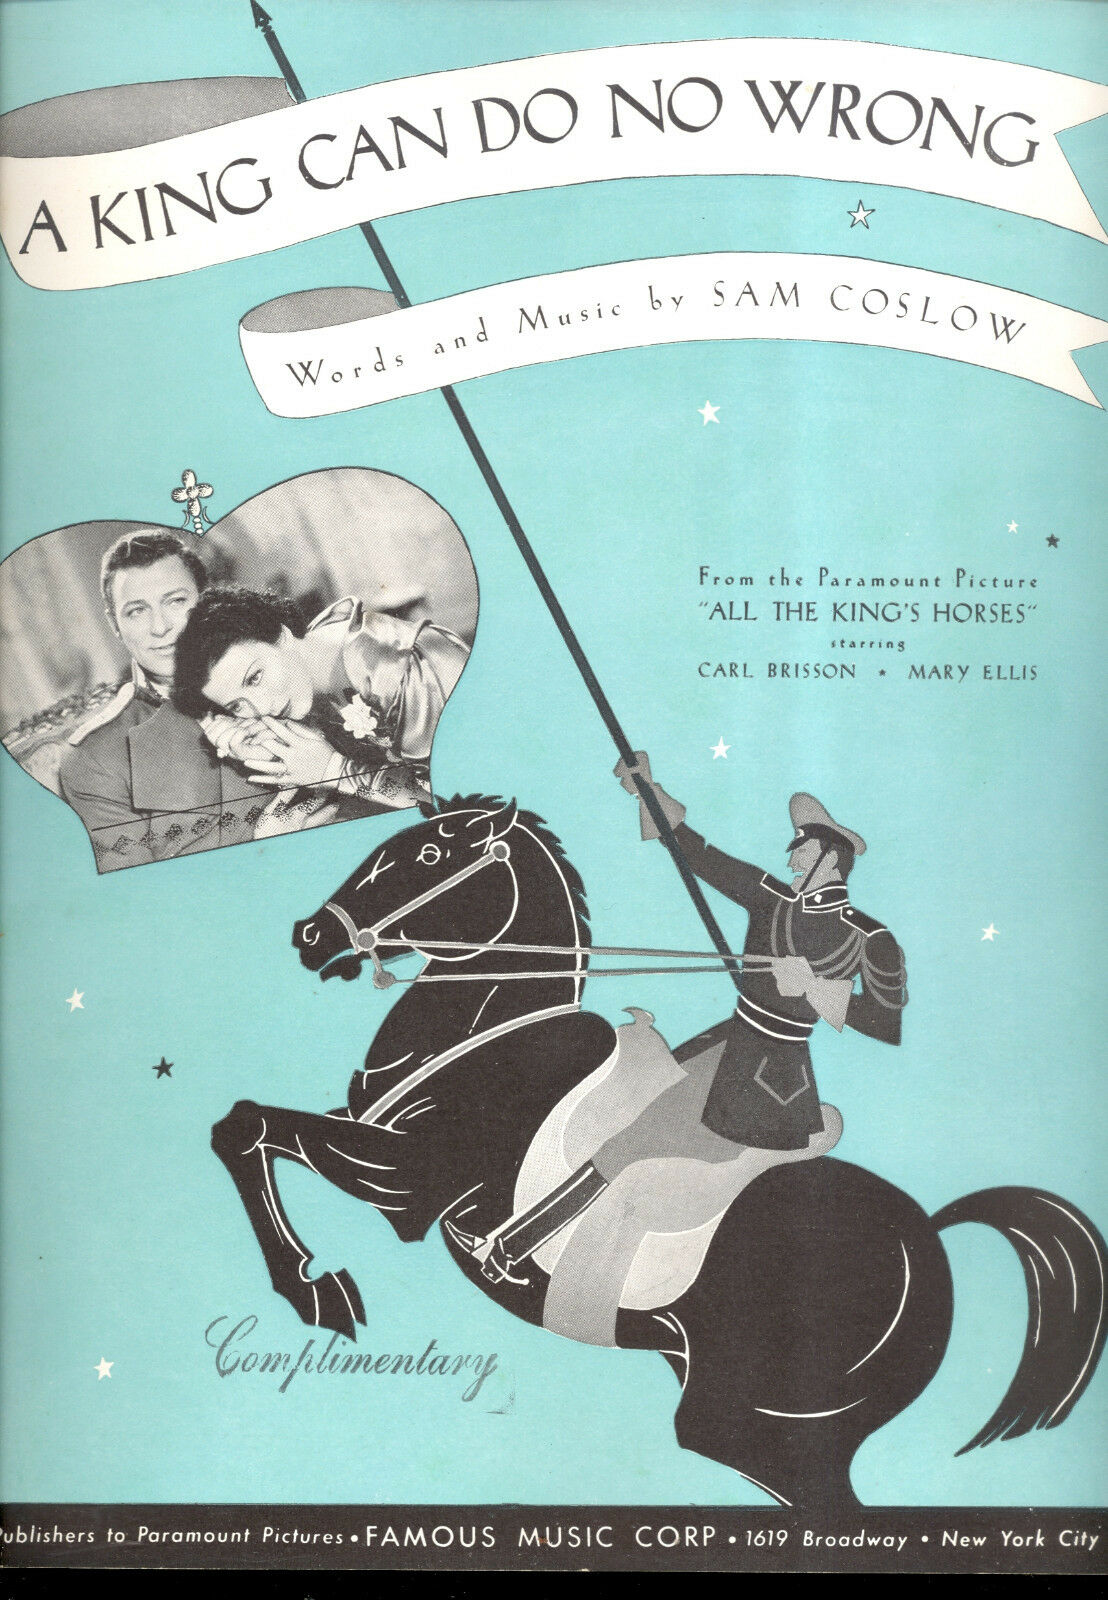 Alle KING'S Horses Notenblatt   A King Can Do No Wrong   Carl Brisson Mary Ellis